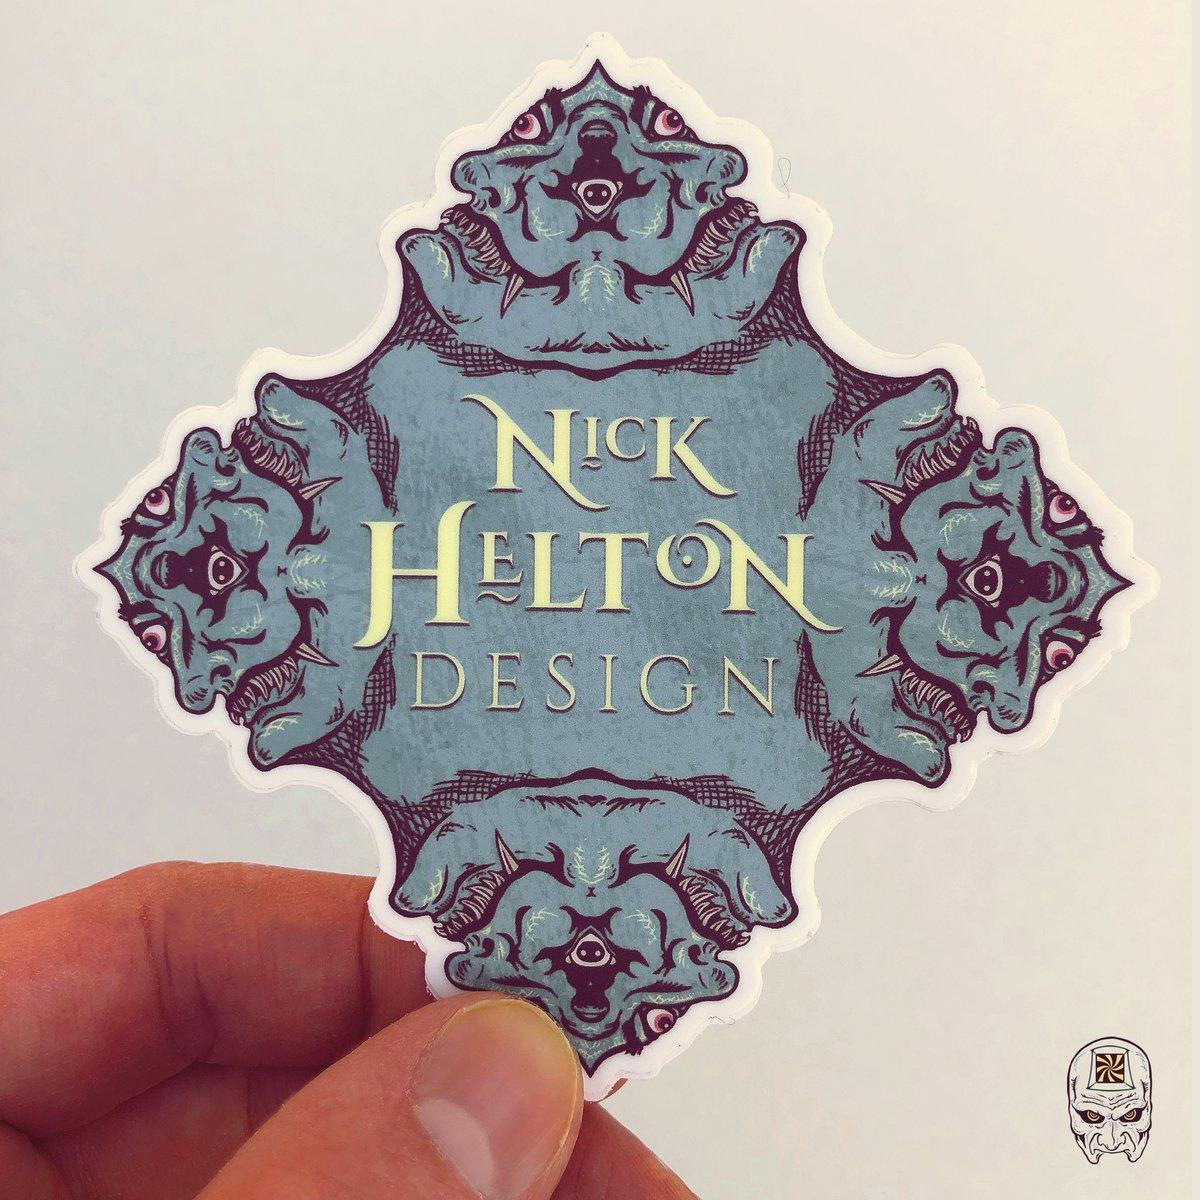 Image of Nick Helton Design Sticker